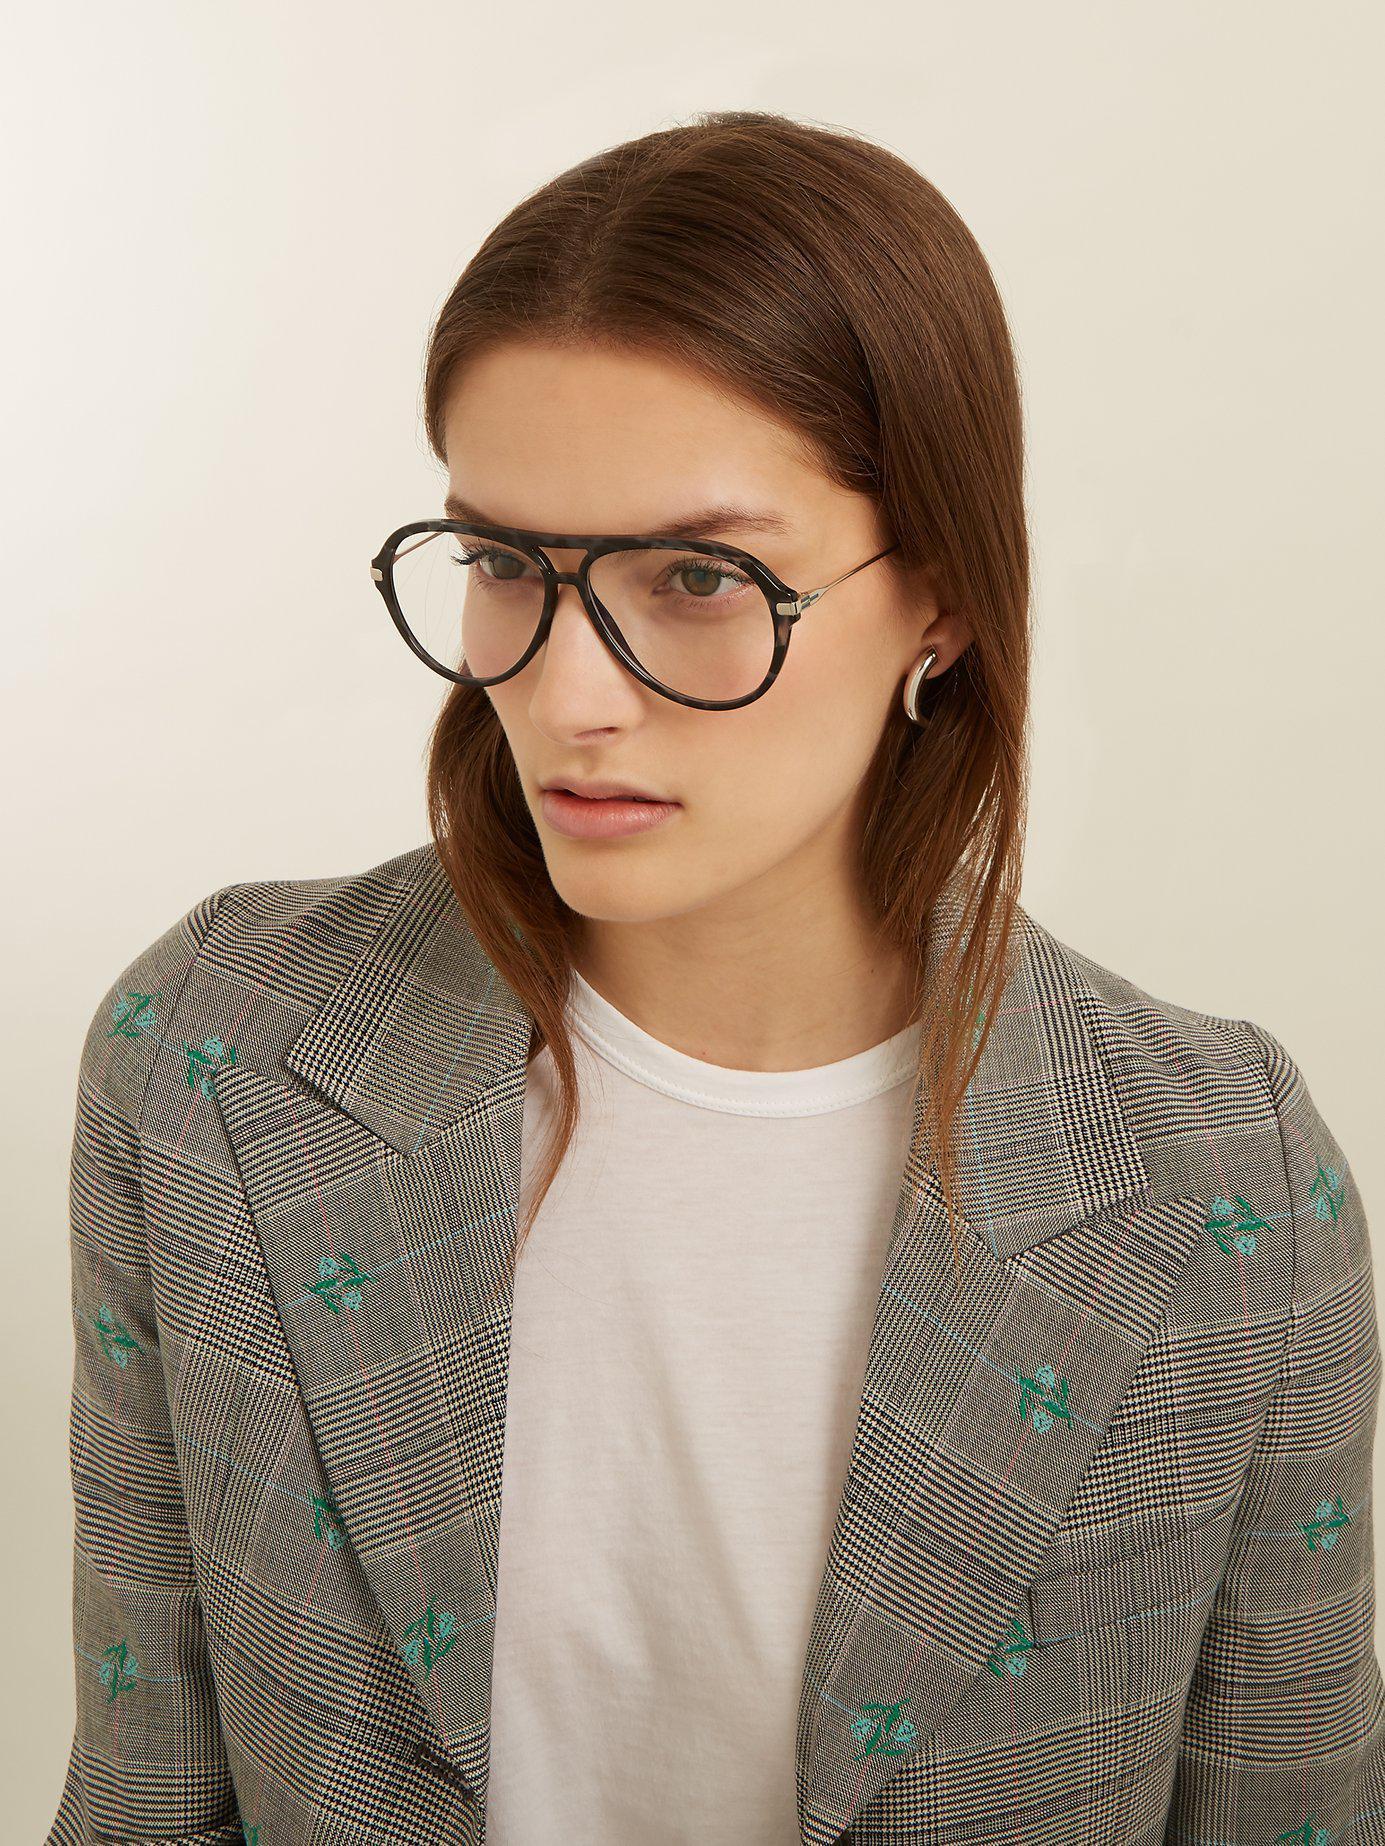 c0b9b0bff1d0 Lyst - Meeyye Symi Tortoiseshell Glasses in Black